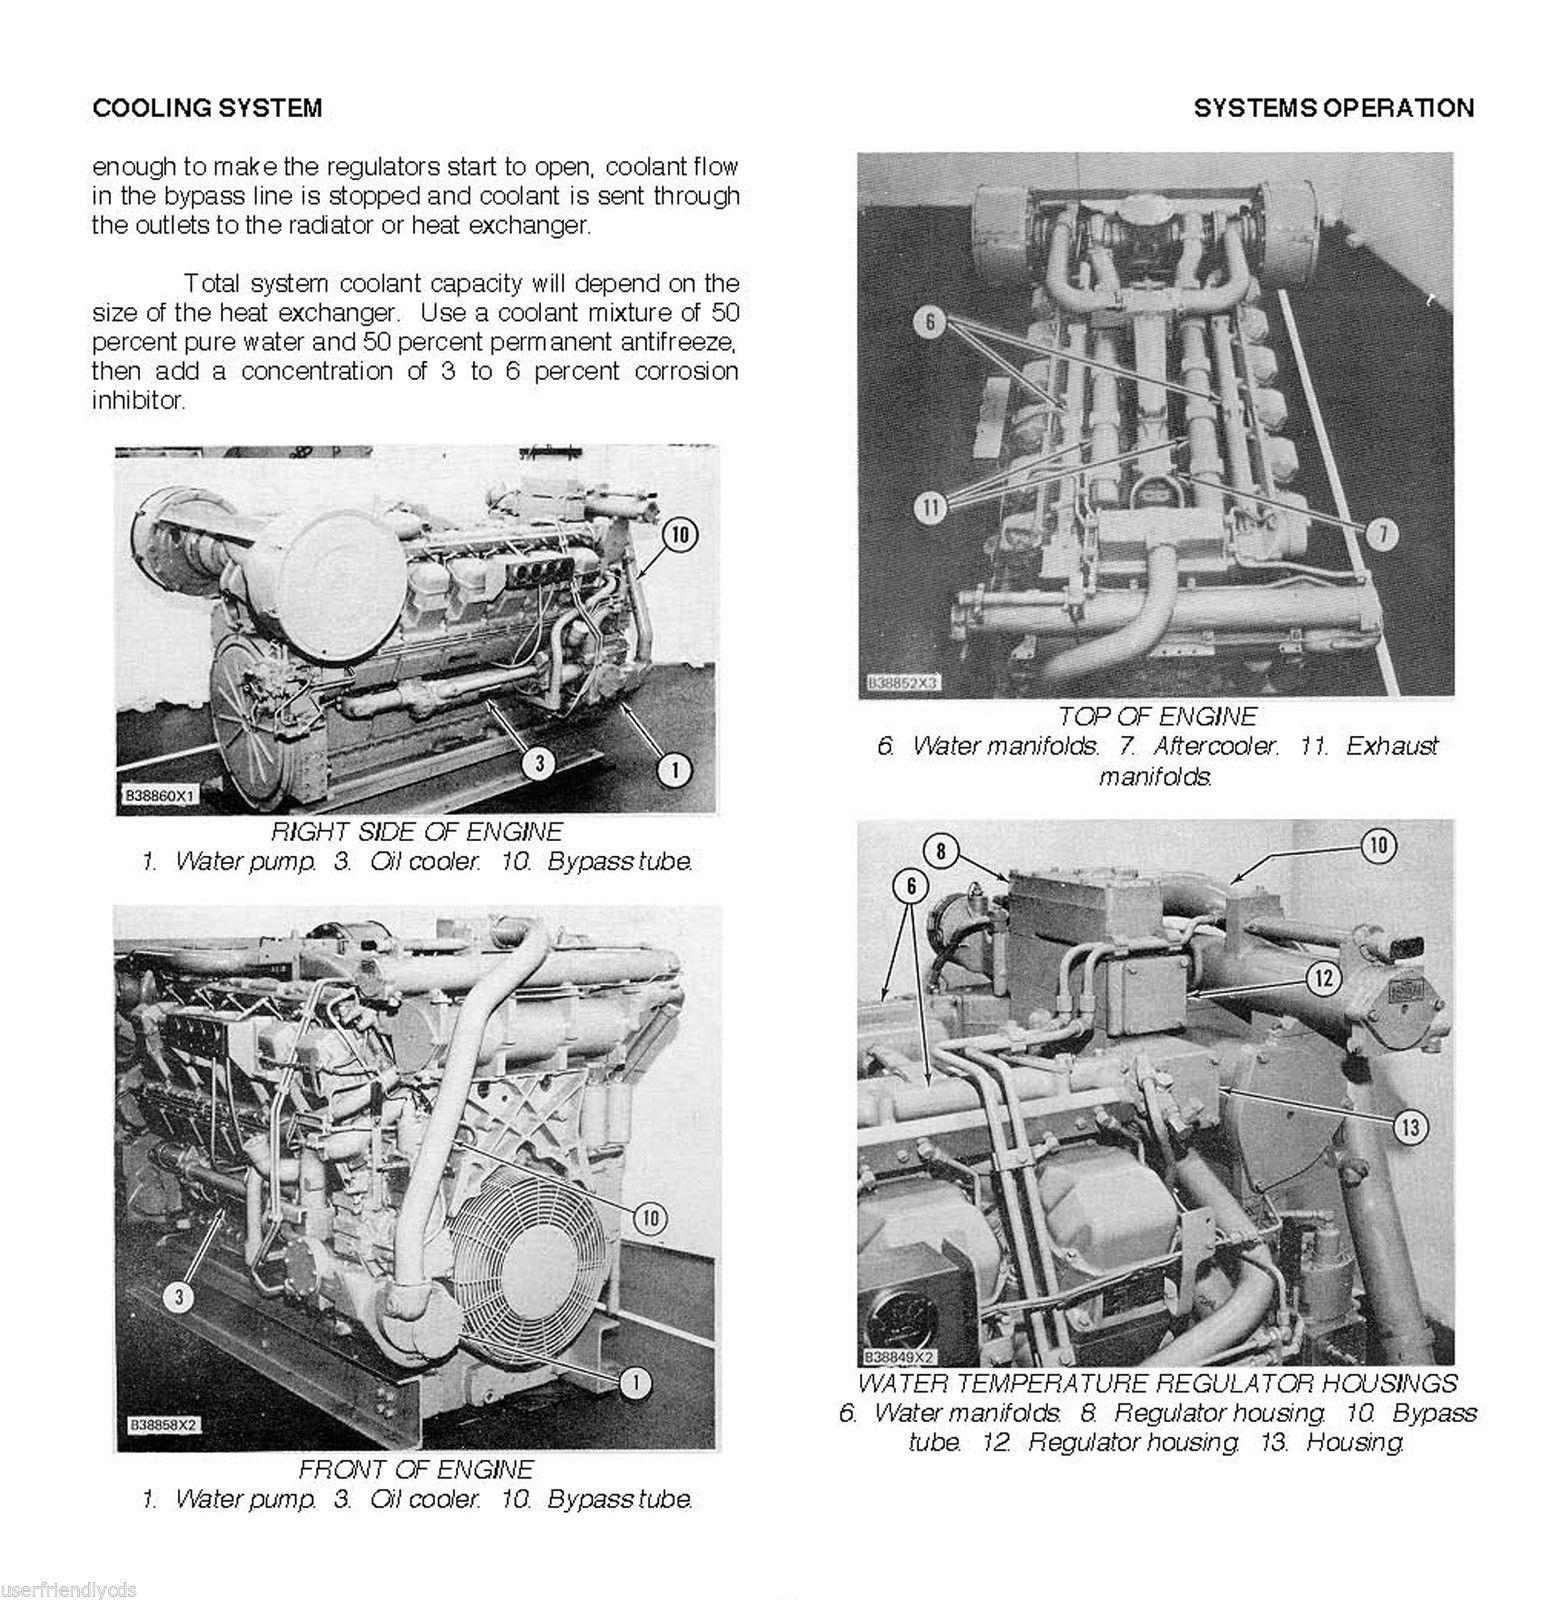 CATERPILLAR 3500 3508 3512 3516 Diesel and 50 similar items